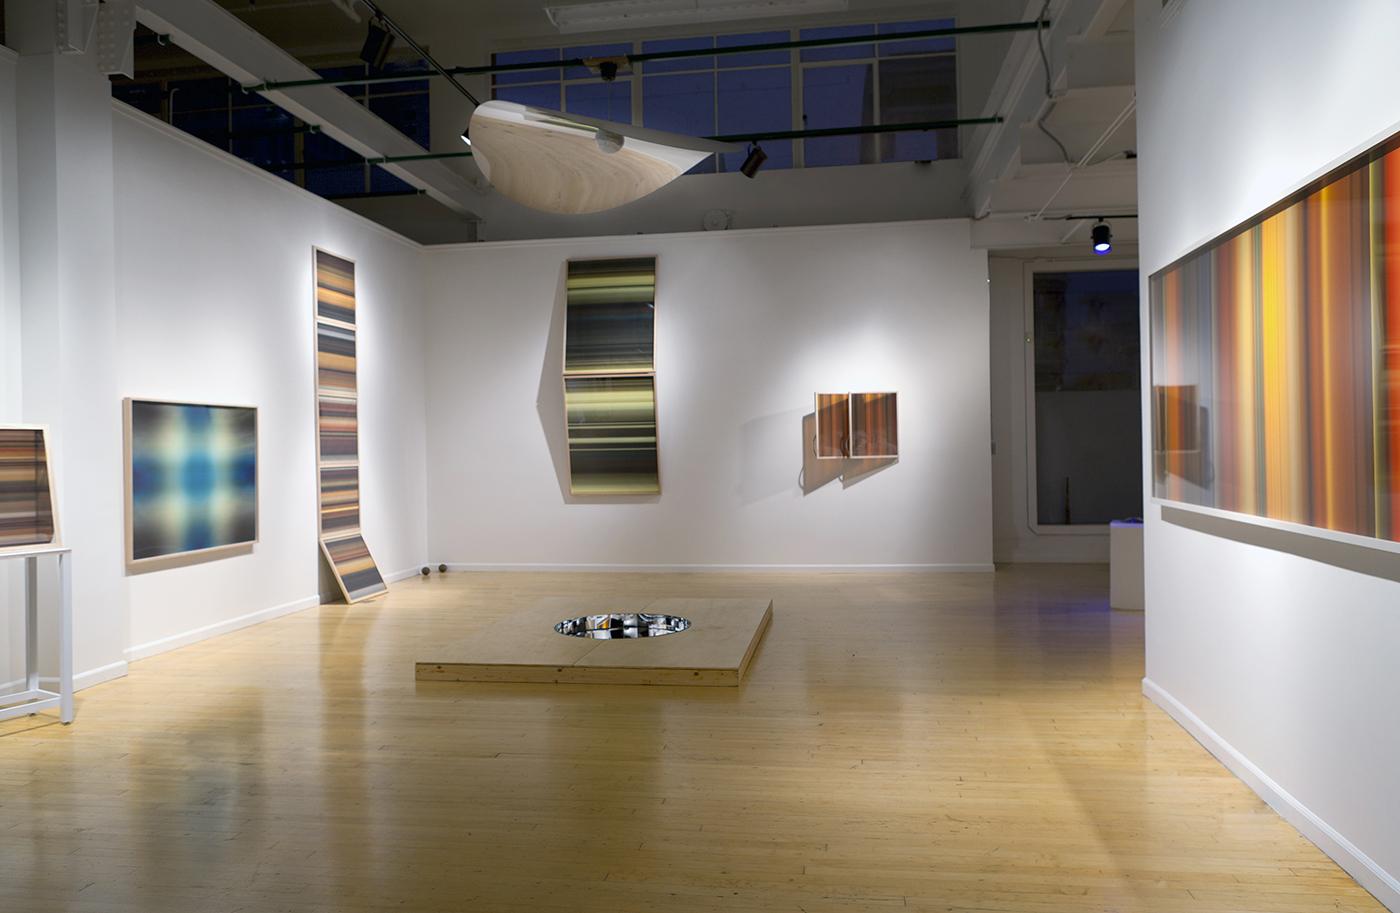 Elaine Buckholtz, Installations photograph of  Light Making Motion: Works on Paper and In Light, 2011. Photograph:Floor van de Velde